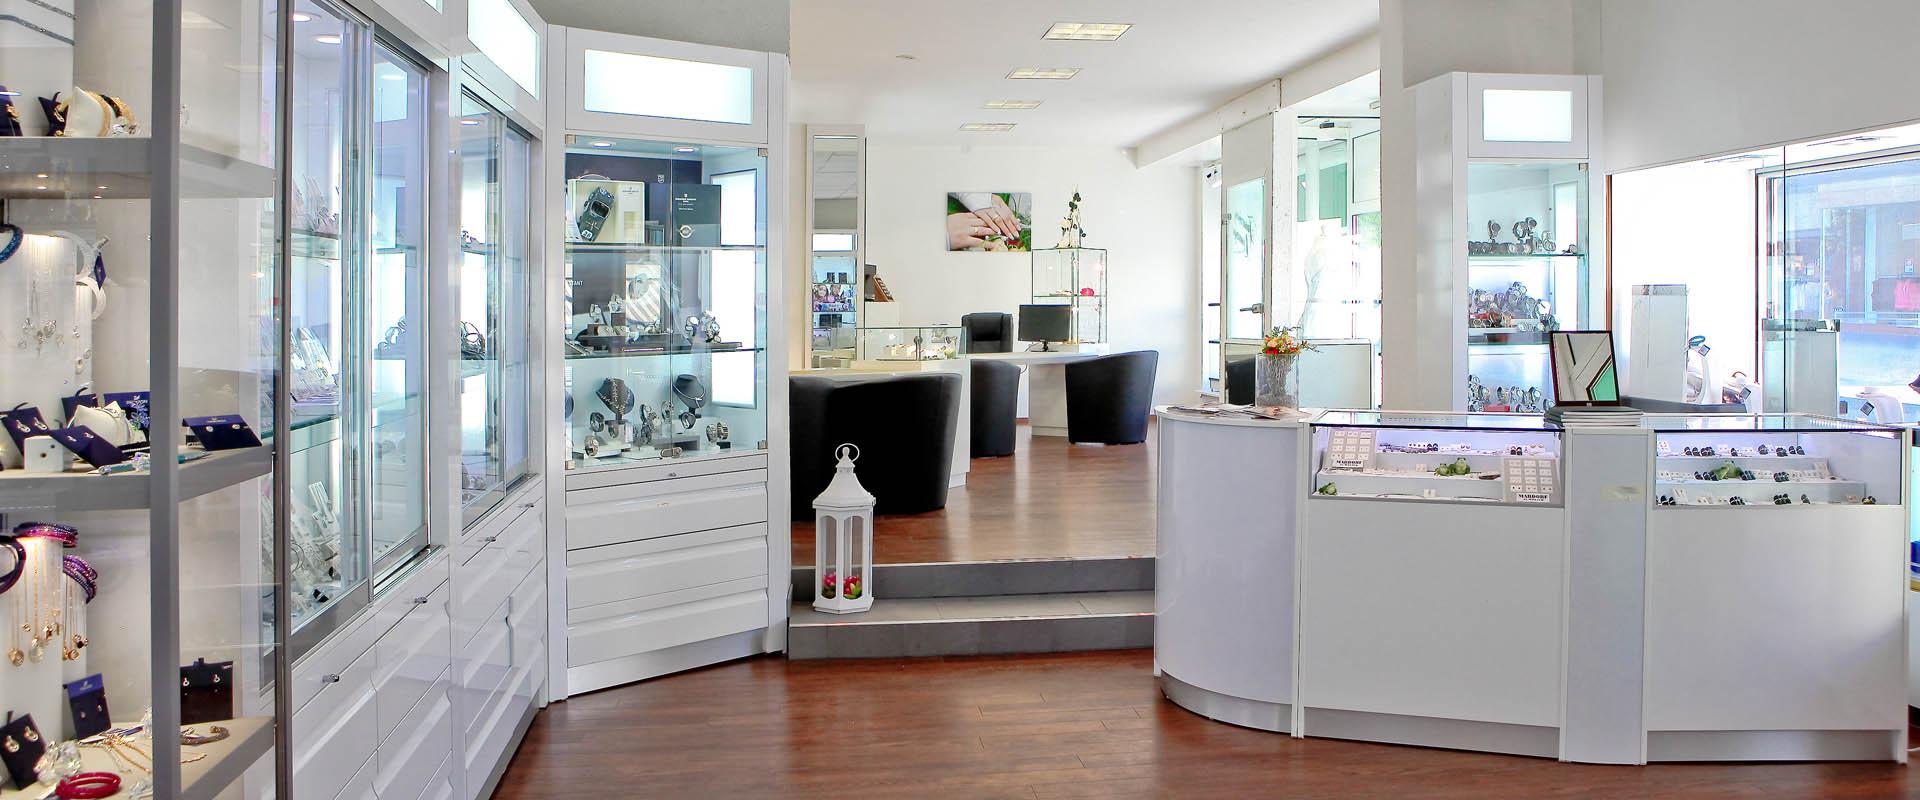 Beratung beim Juwelier Tobias Mardorf in Villingen-Schwenningen